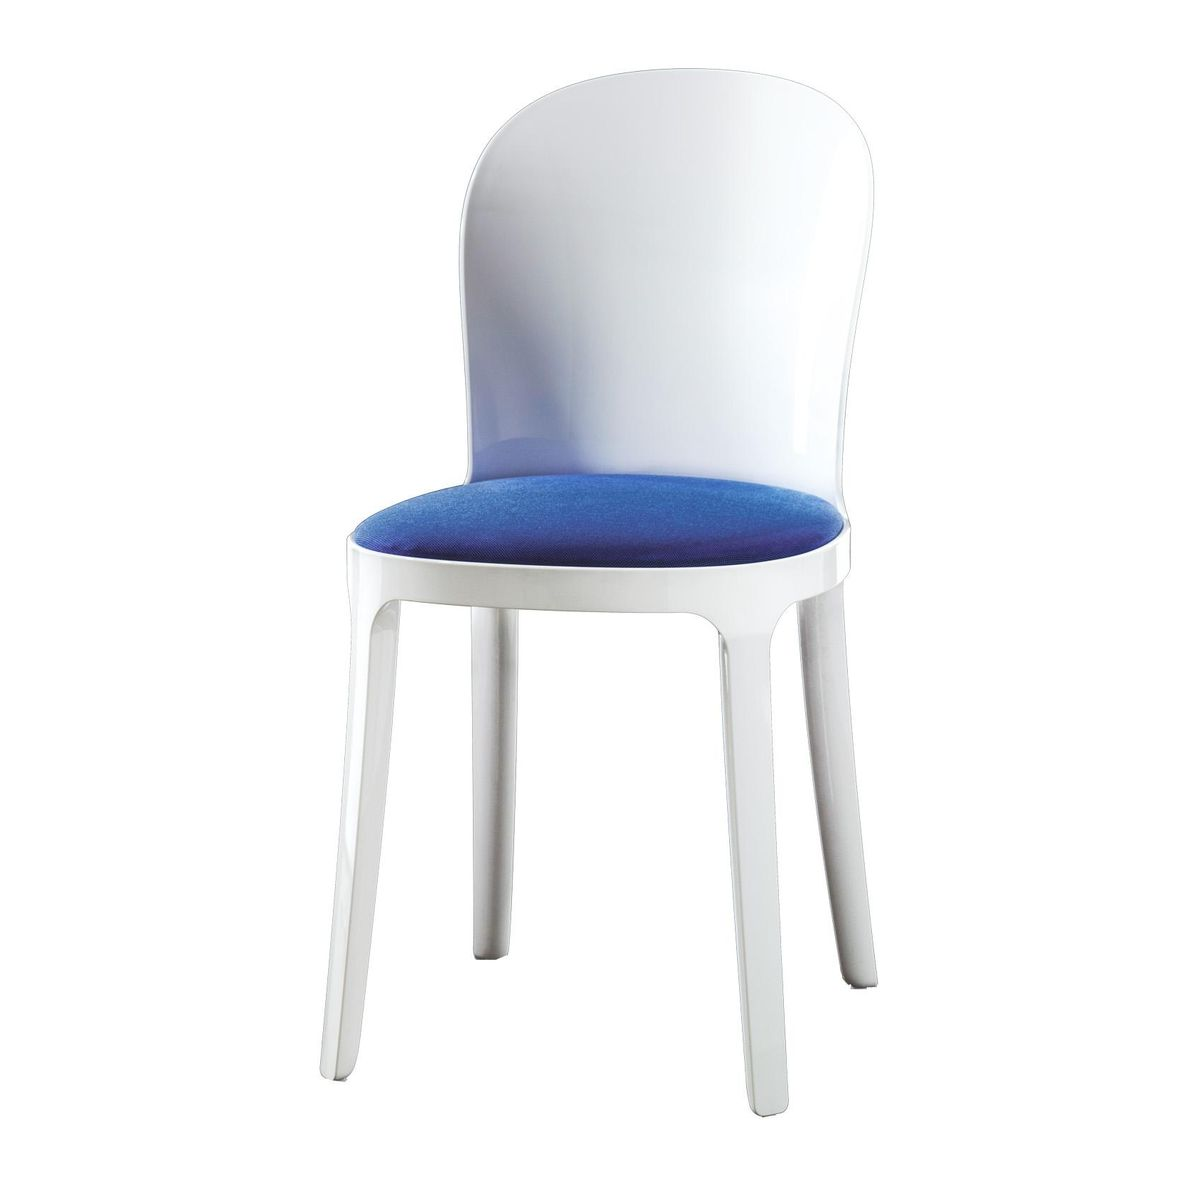 vanity chair white magis. Black Bedroom Furniture Sets. Home Design Ideas